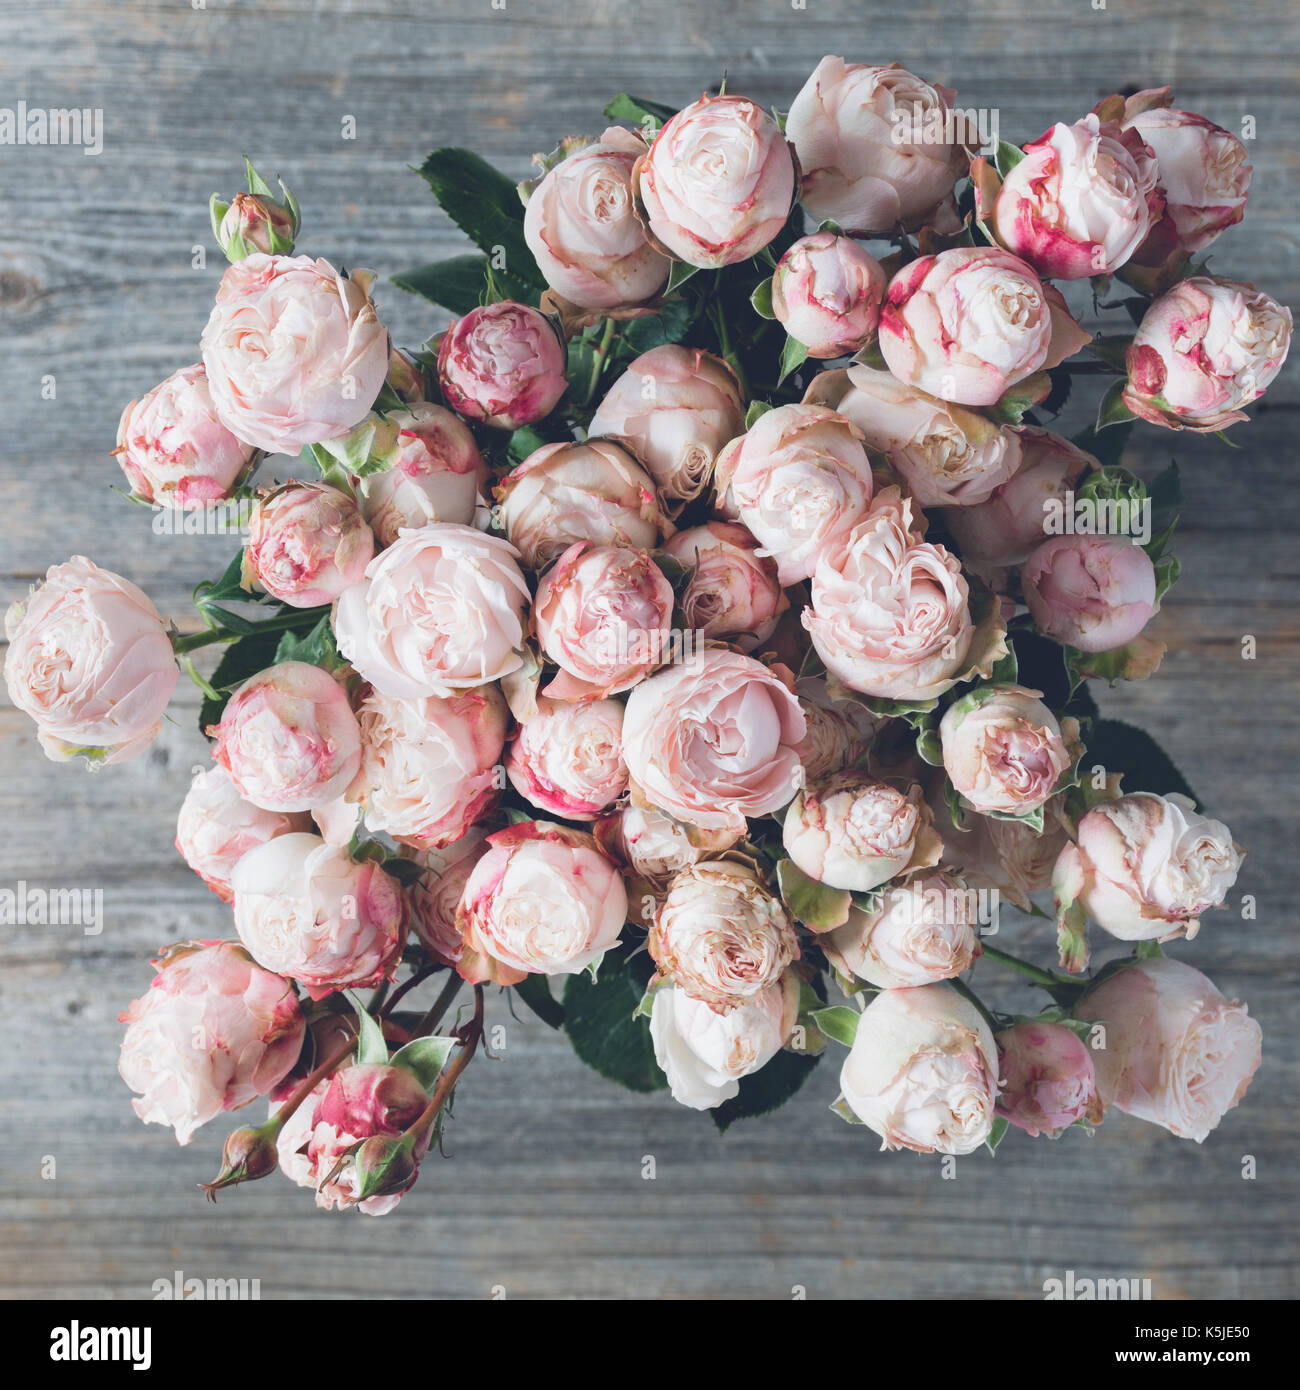 retro background beautiful pink rose stockfotos retro background beautiful pink rose bilder. Black Bedroom Furniture Sets. Home Design Ideas